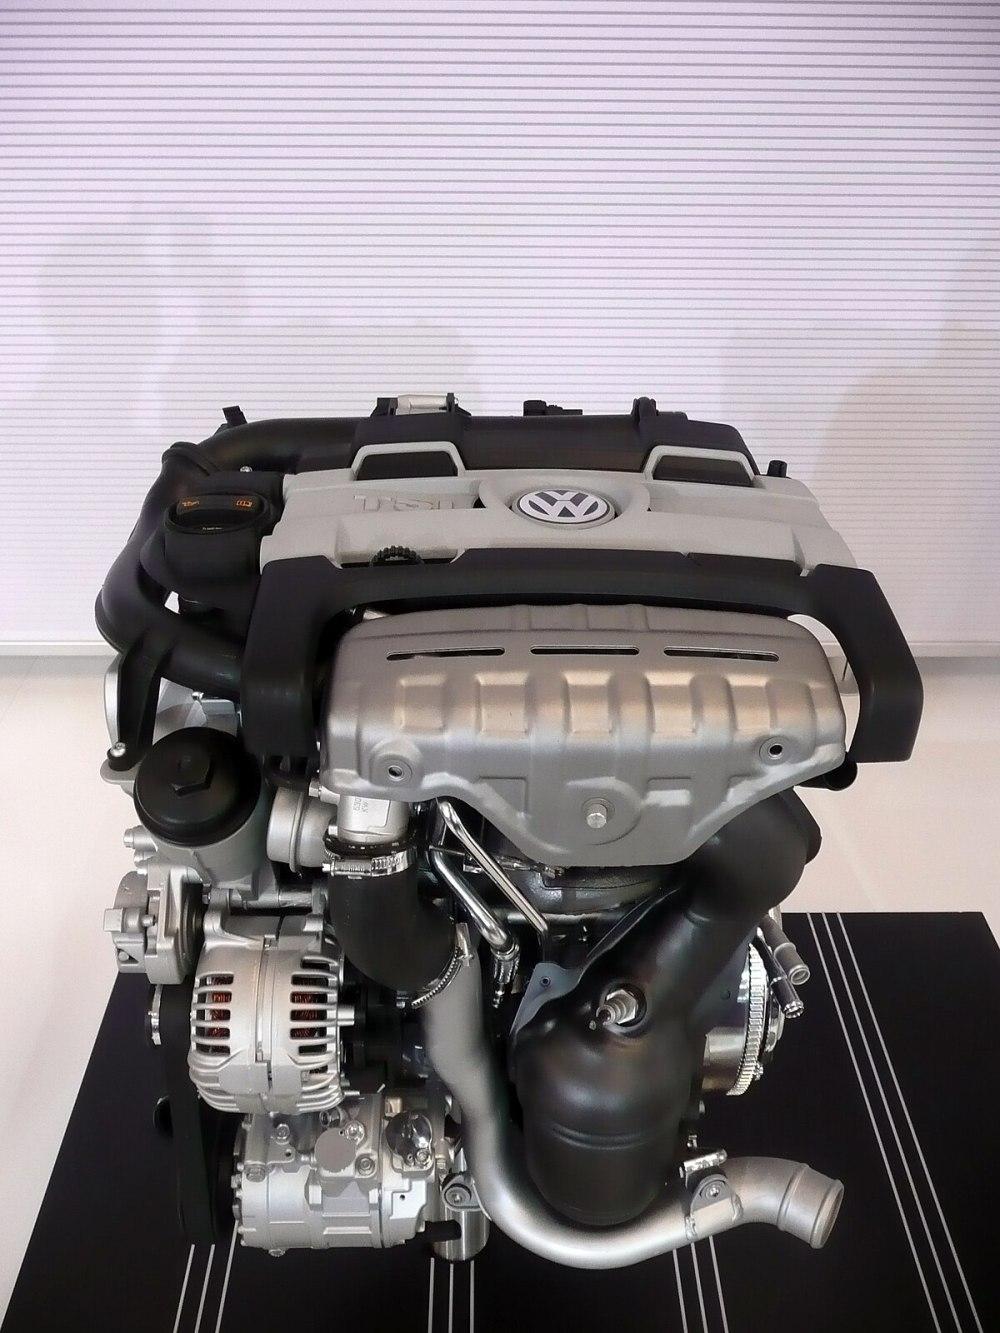 medium resolution of list of volkswagen group petrol engines wikipedia 1 8 turbo engine diagram